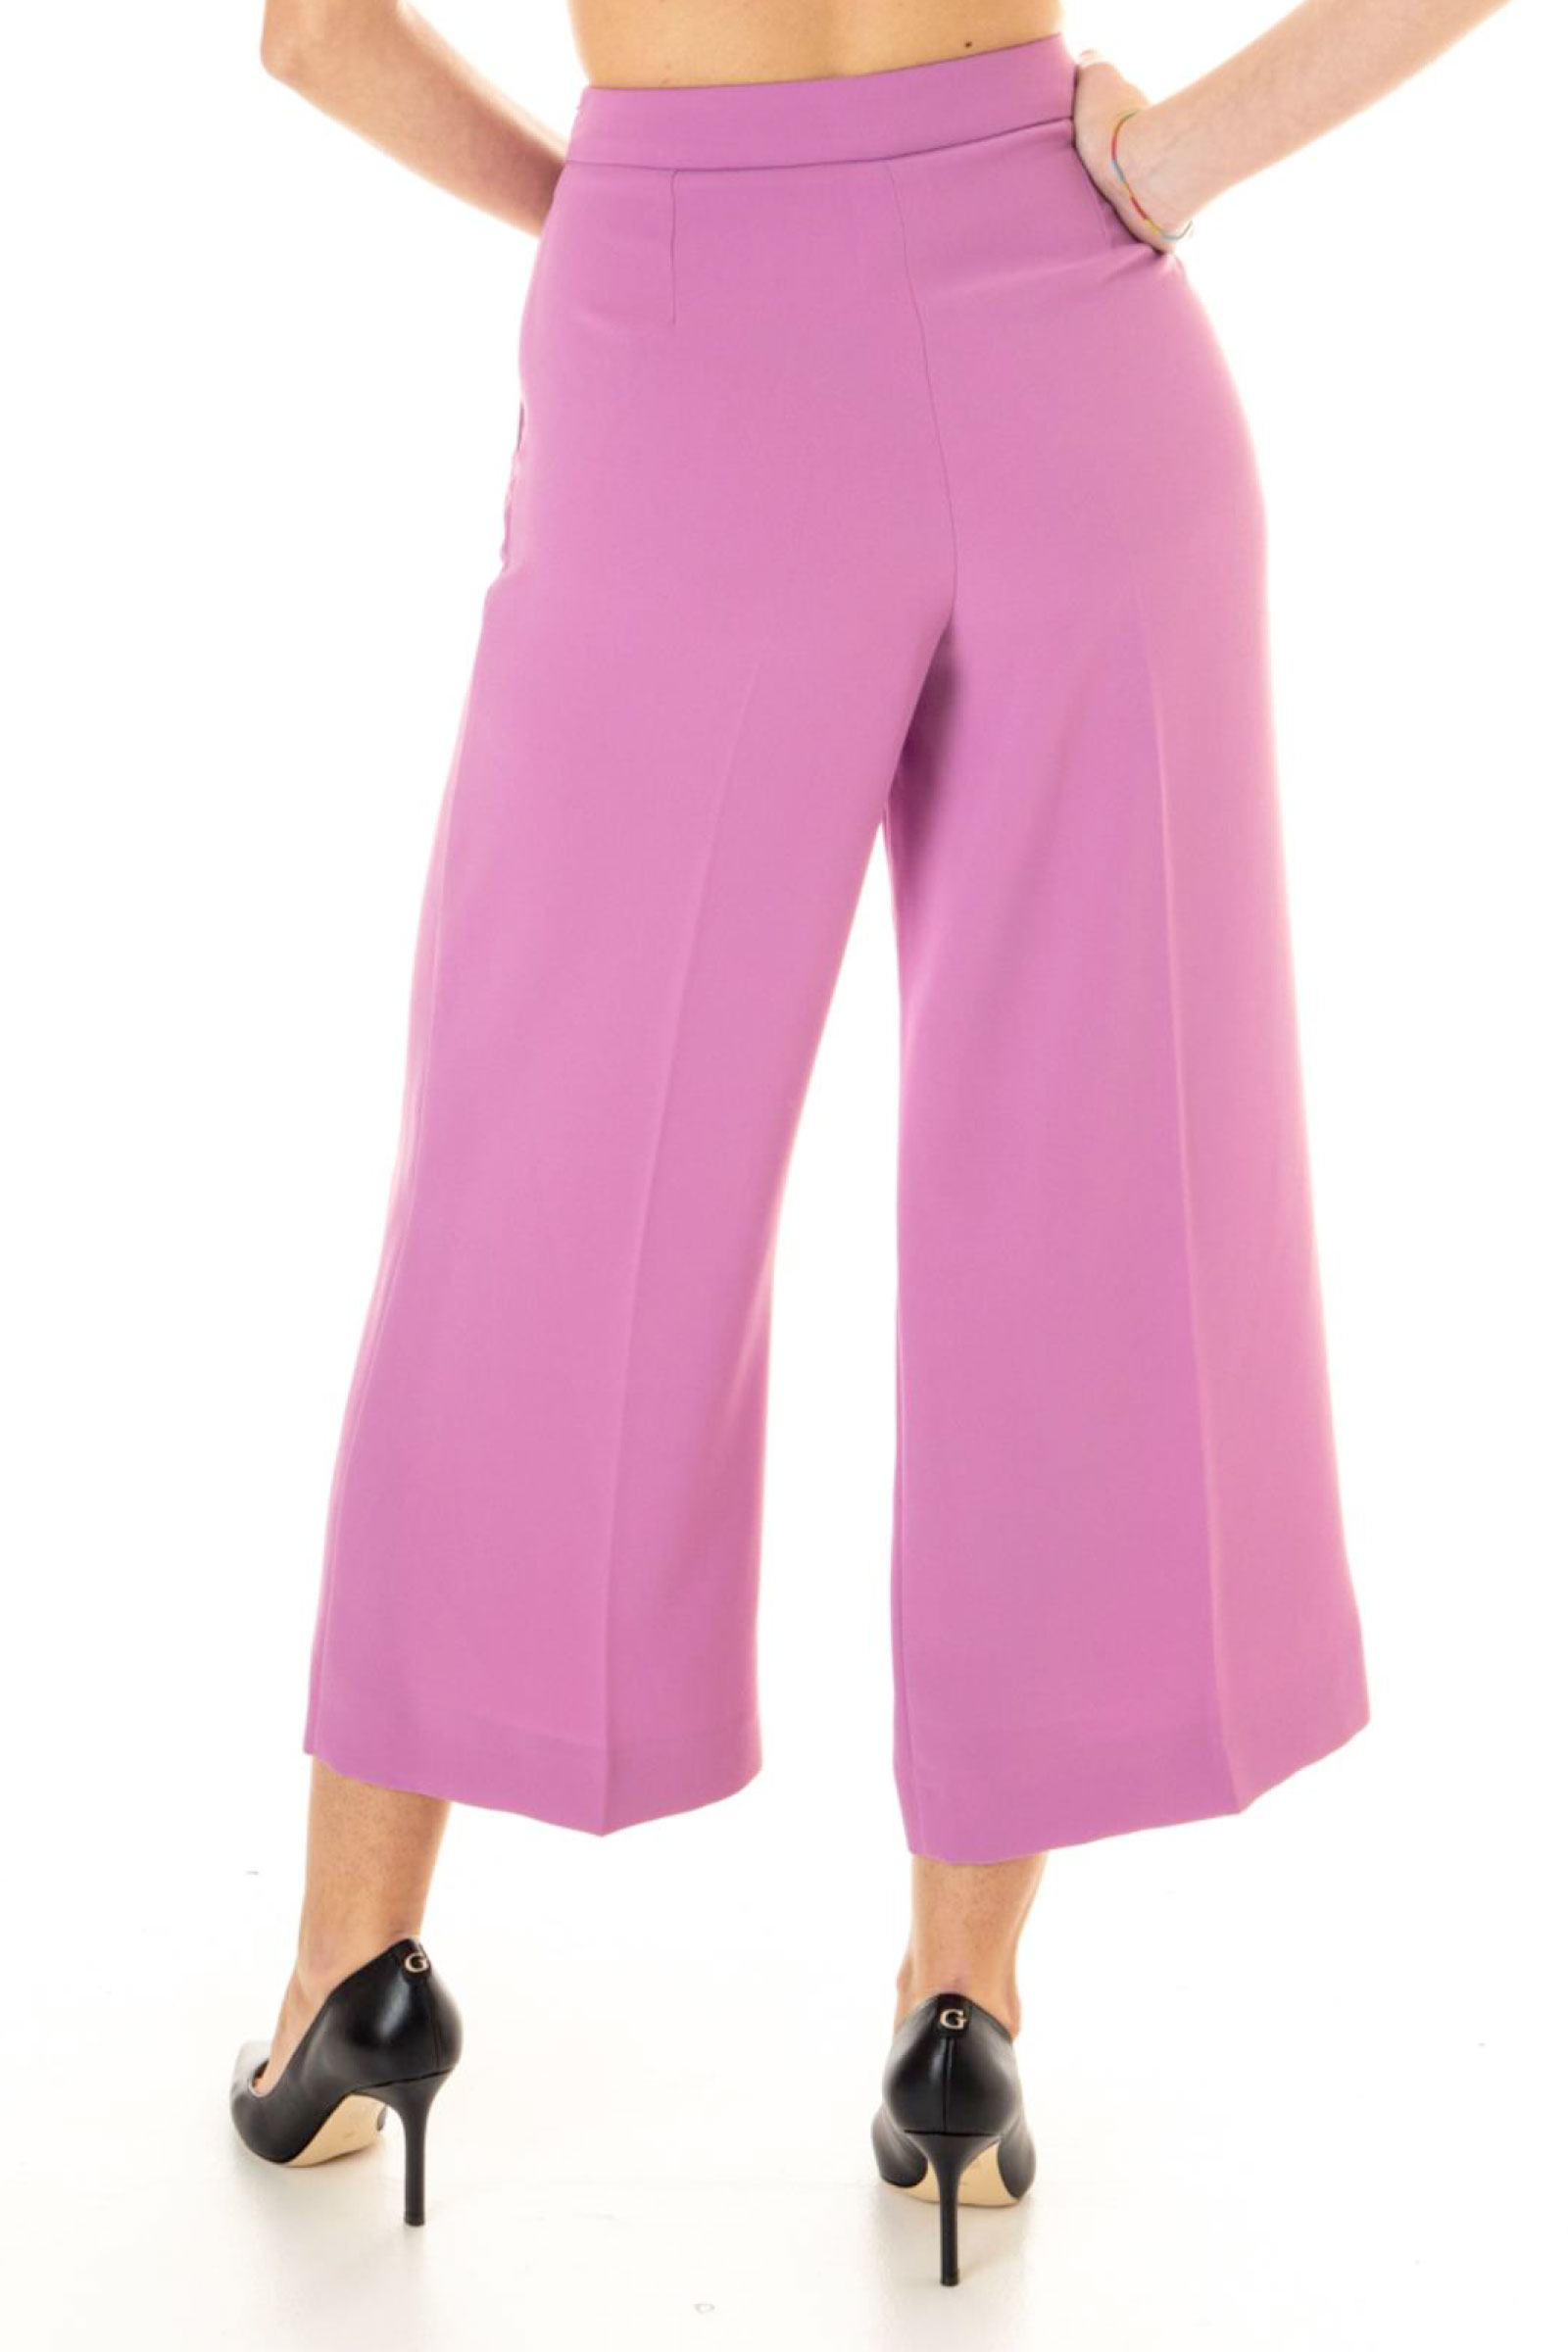 EMME MARELLA Pantalone Modello PITONE EMME MARELLA | Pantalone | 51312915000004